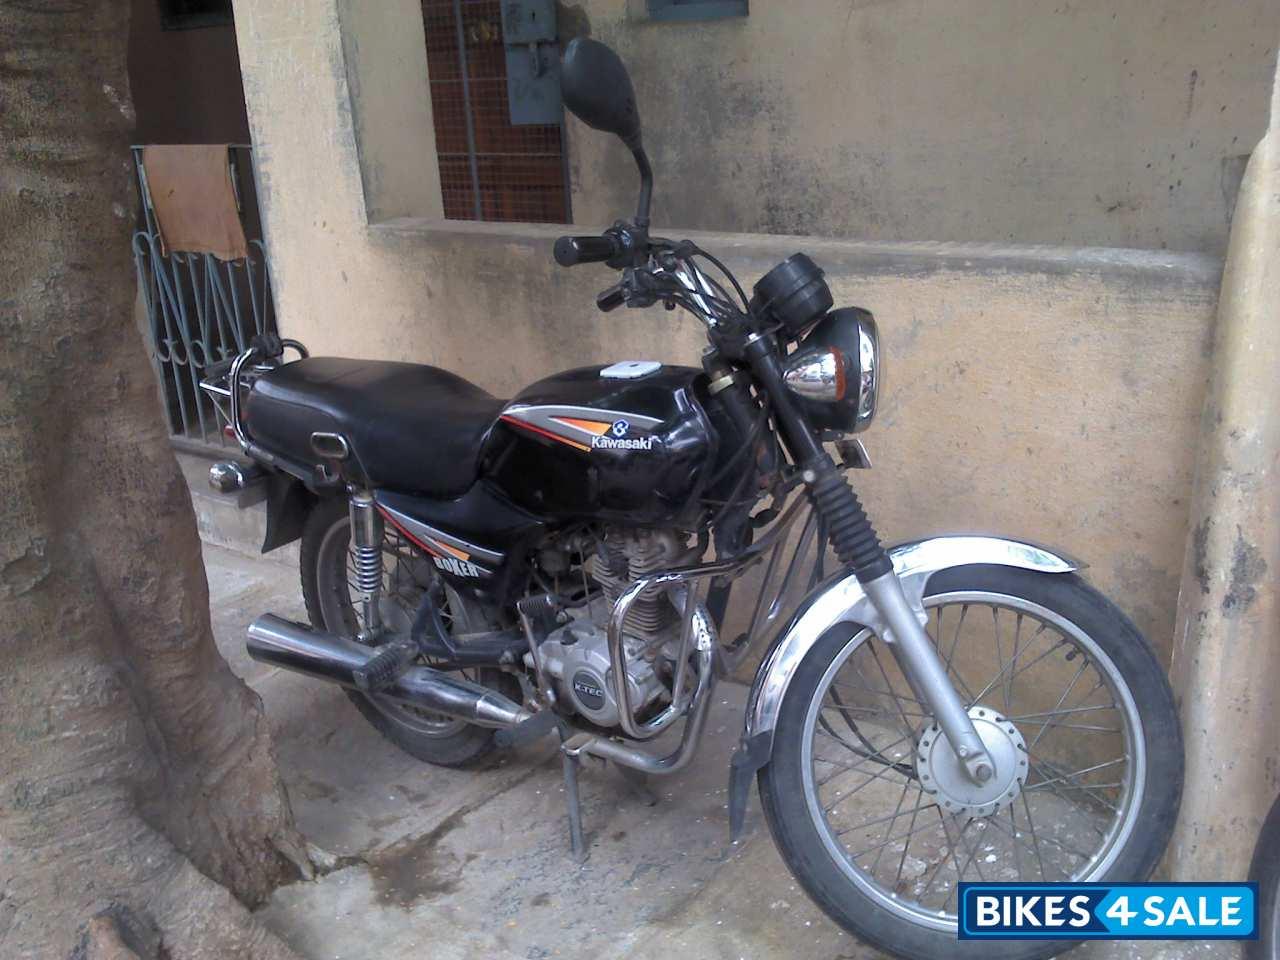 bajaj boxer ct deluxe picture 1 album id is 85423 bike. Black Bedroom Furniture Sets. Home Design Ideas